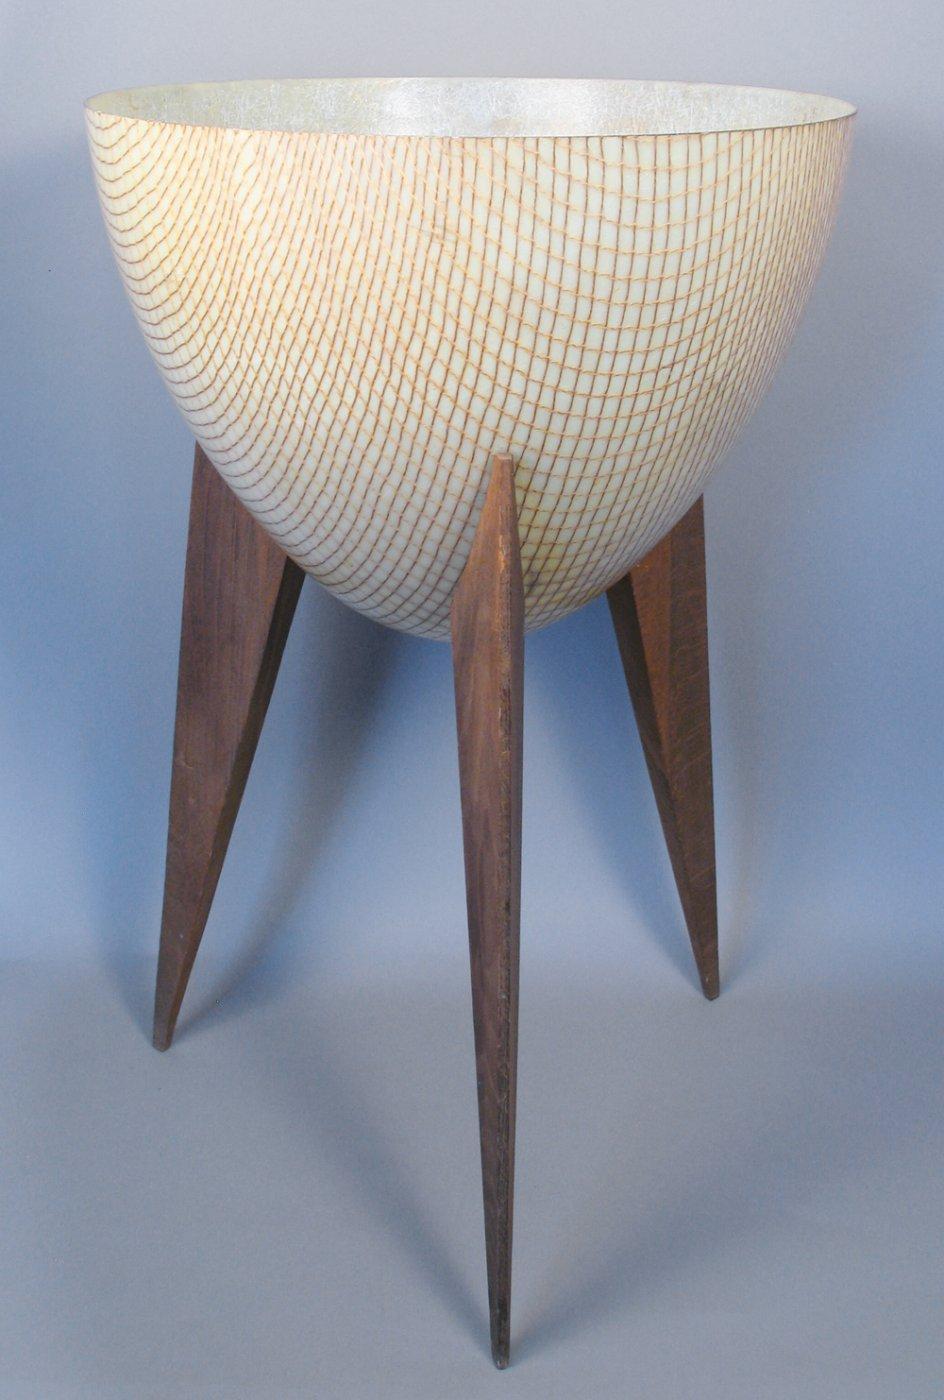 Mid Century Modern Bullet Planter With Wooden Legs C 1950 Shiprock Santa Fe